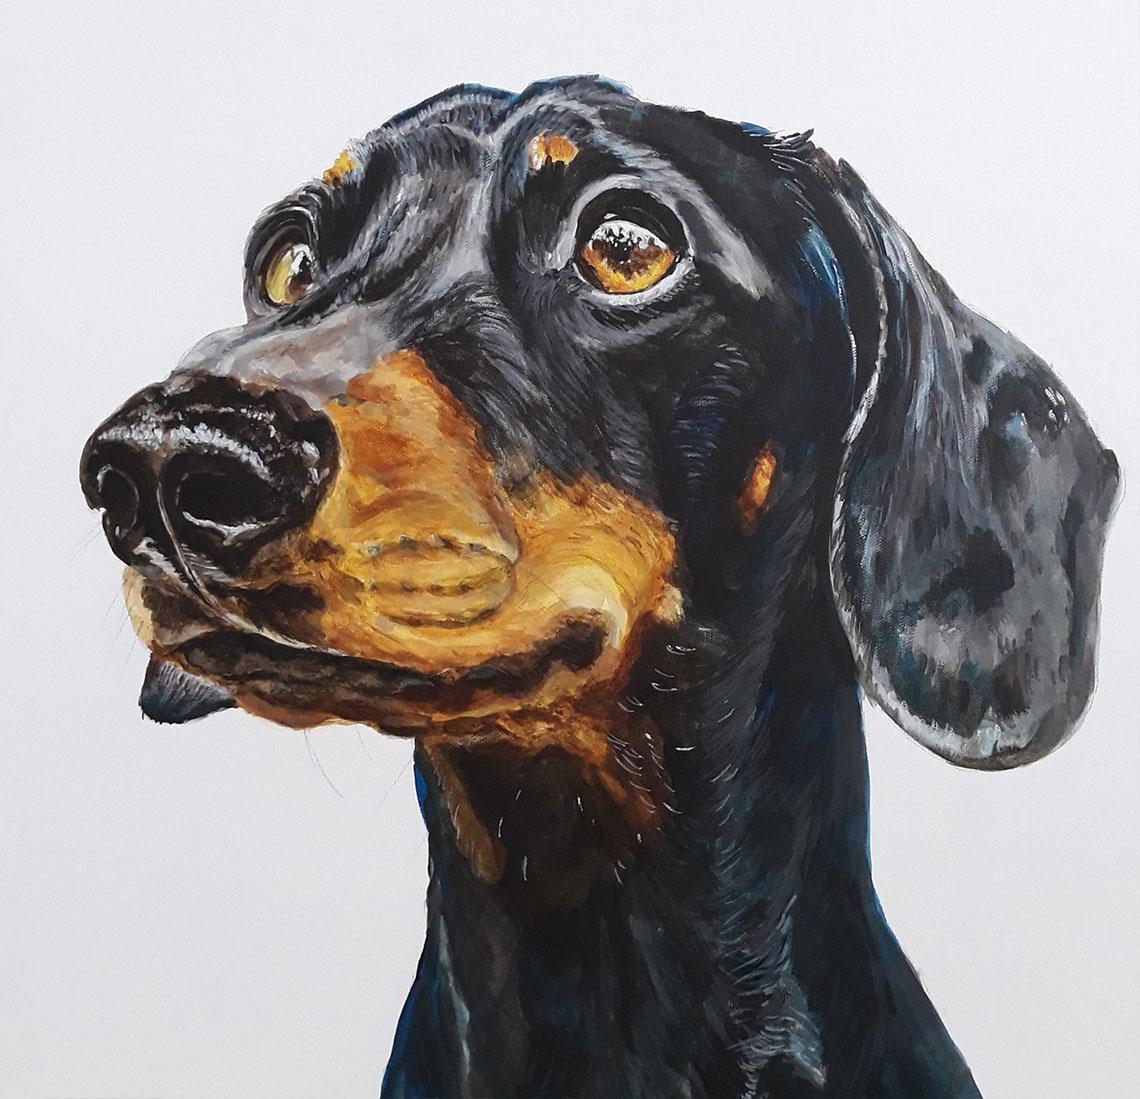 jean-ballands-australian-port-macquarie-artis-dog-portraits